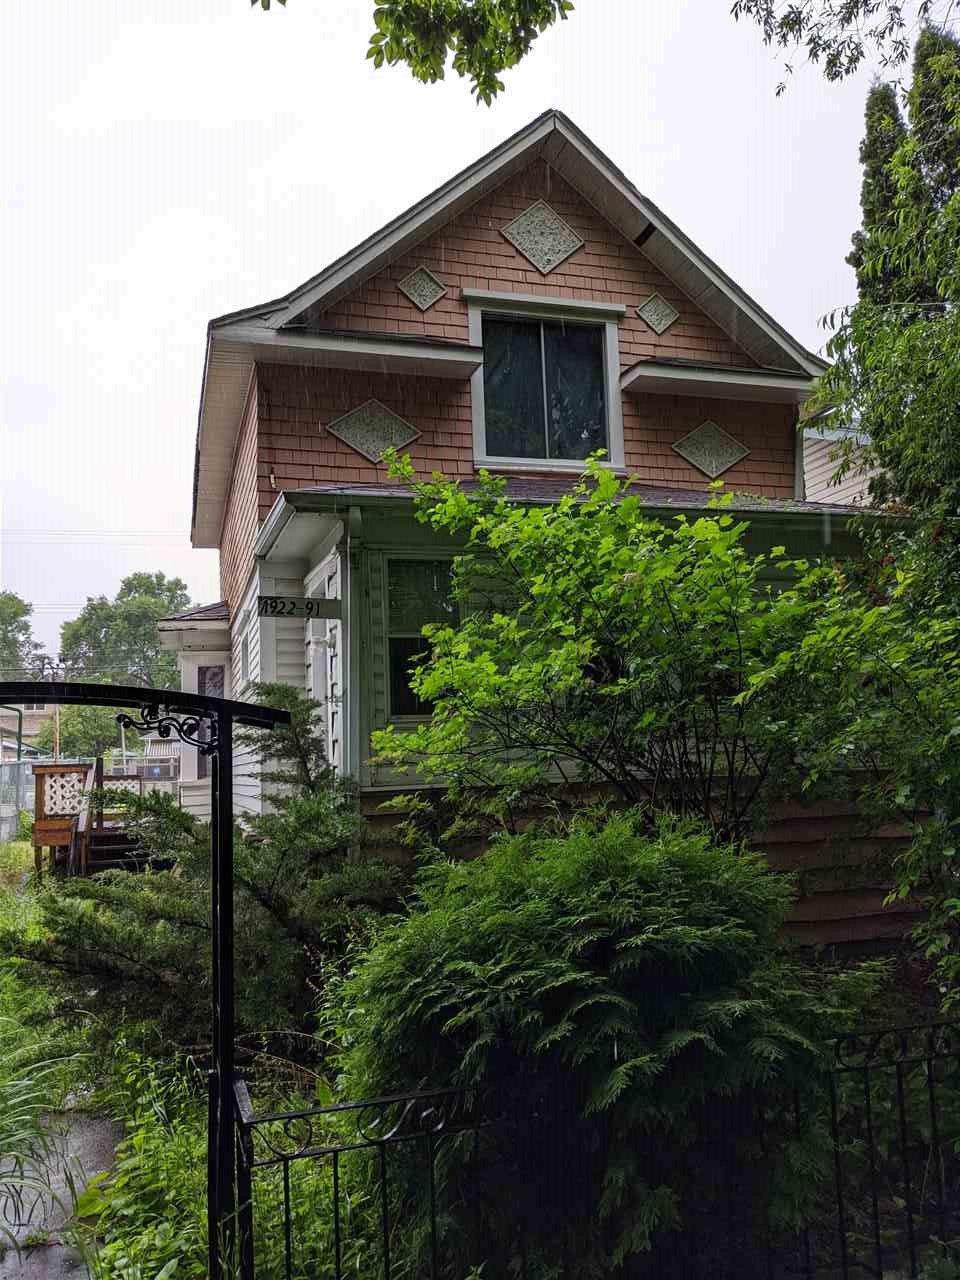 Main Photo: 11922 91 Street in Edmonton: Zone 05 House for sale : MLS®# E4206367